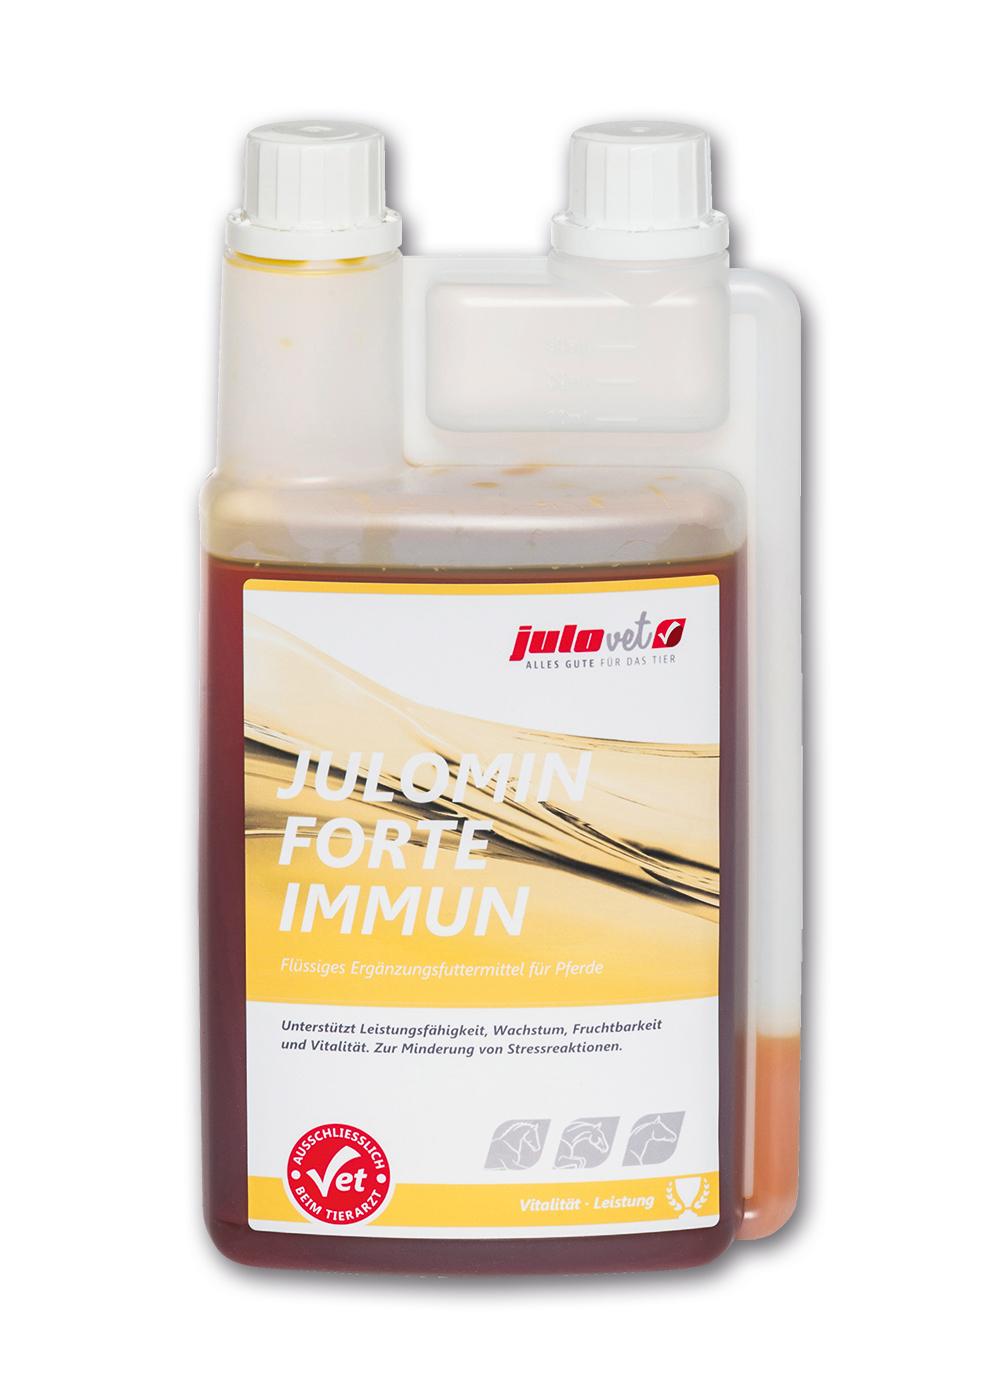 Julomin Forte Immun